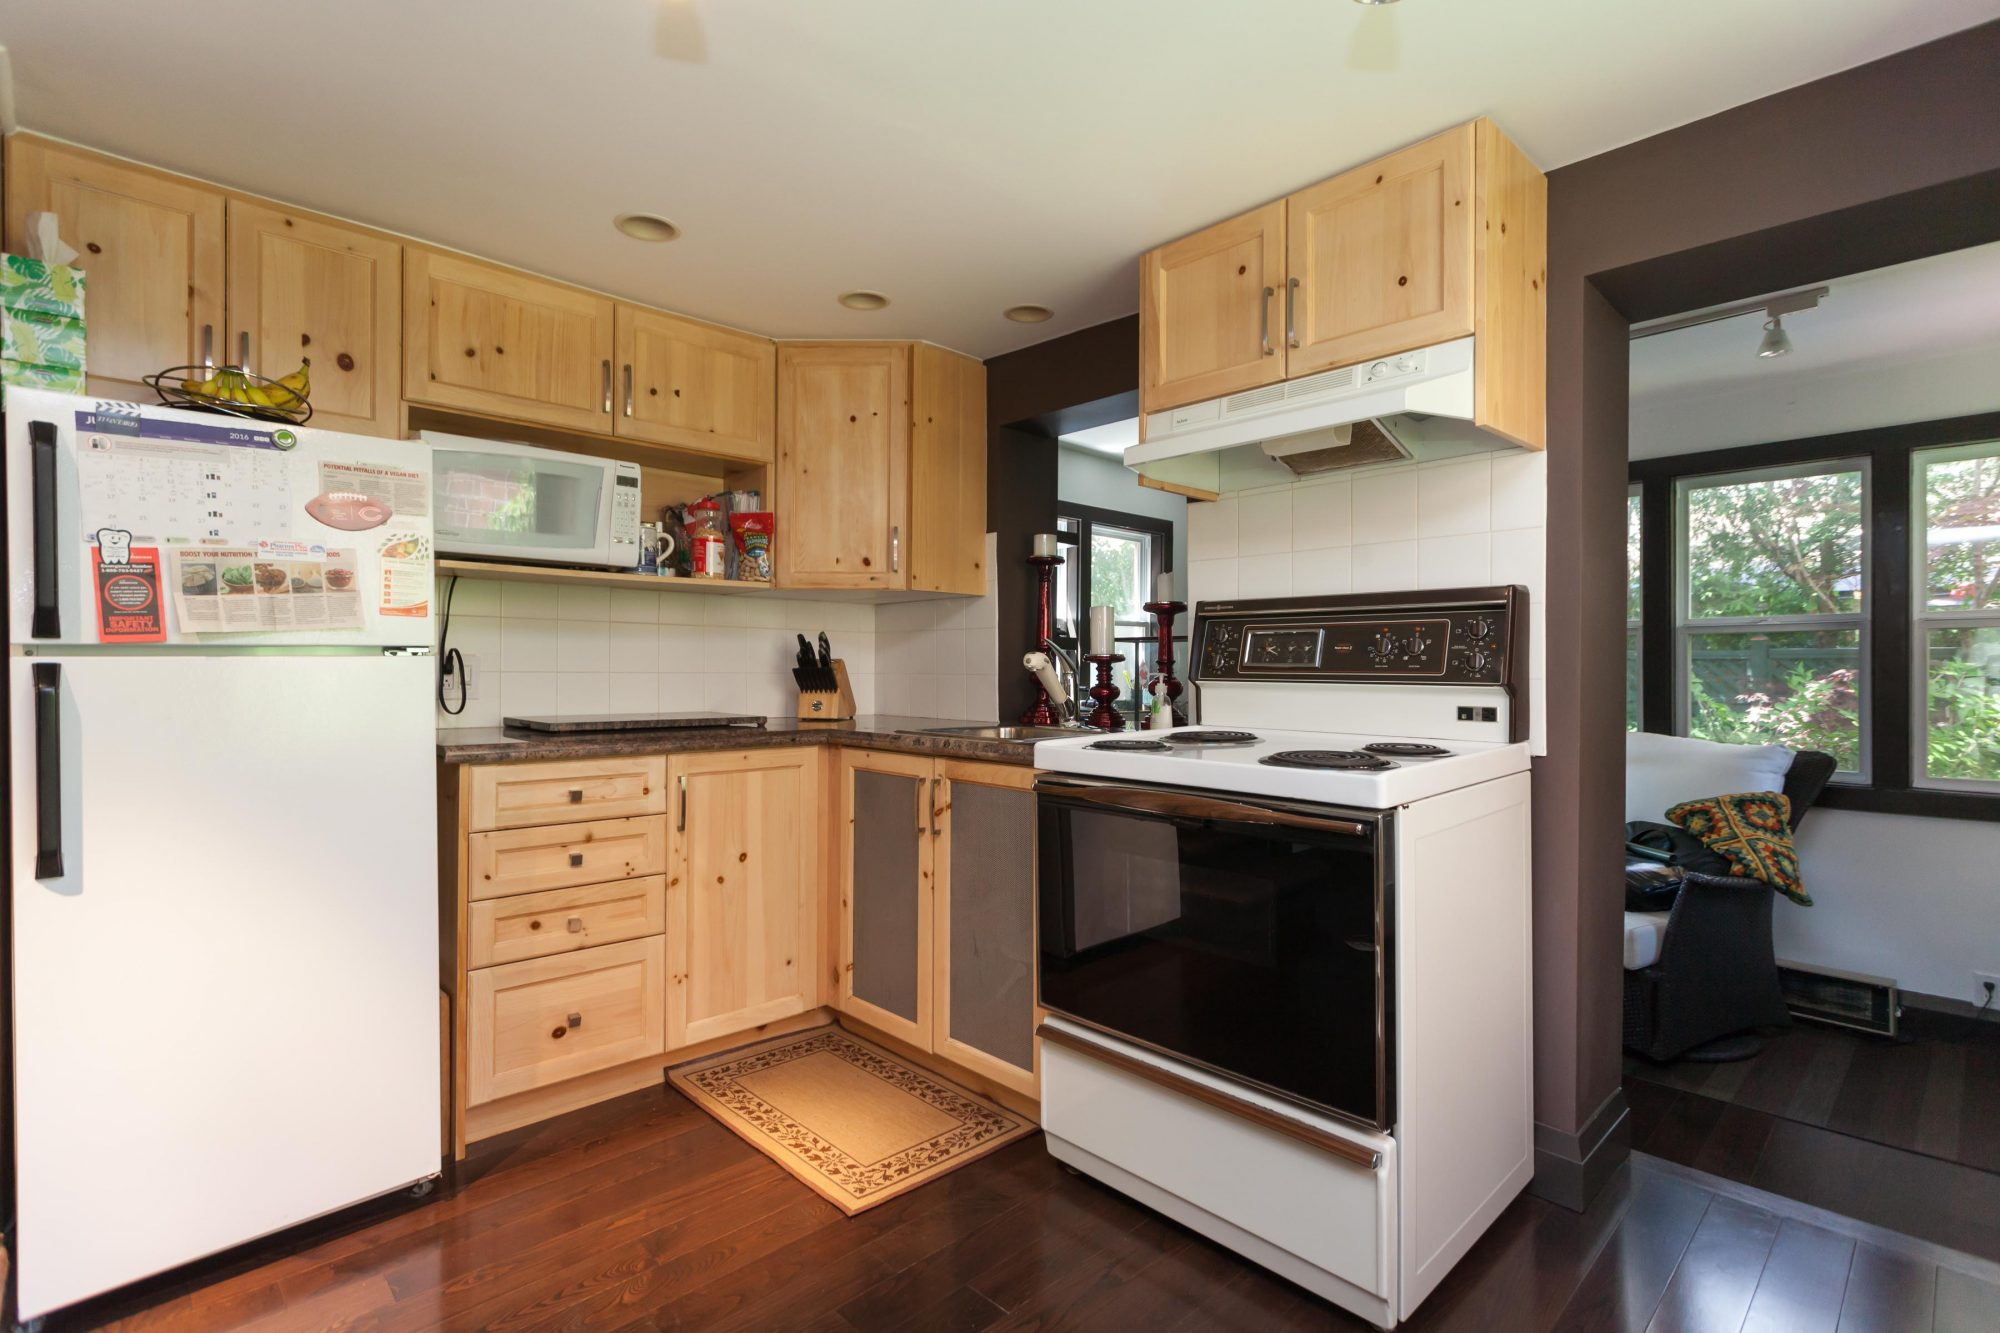 toronto-house-sold-112-helendale-avenue-4